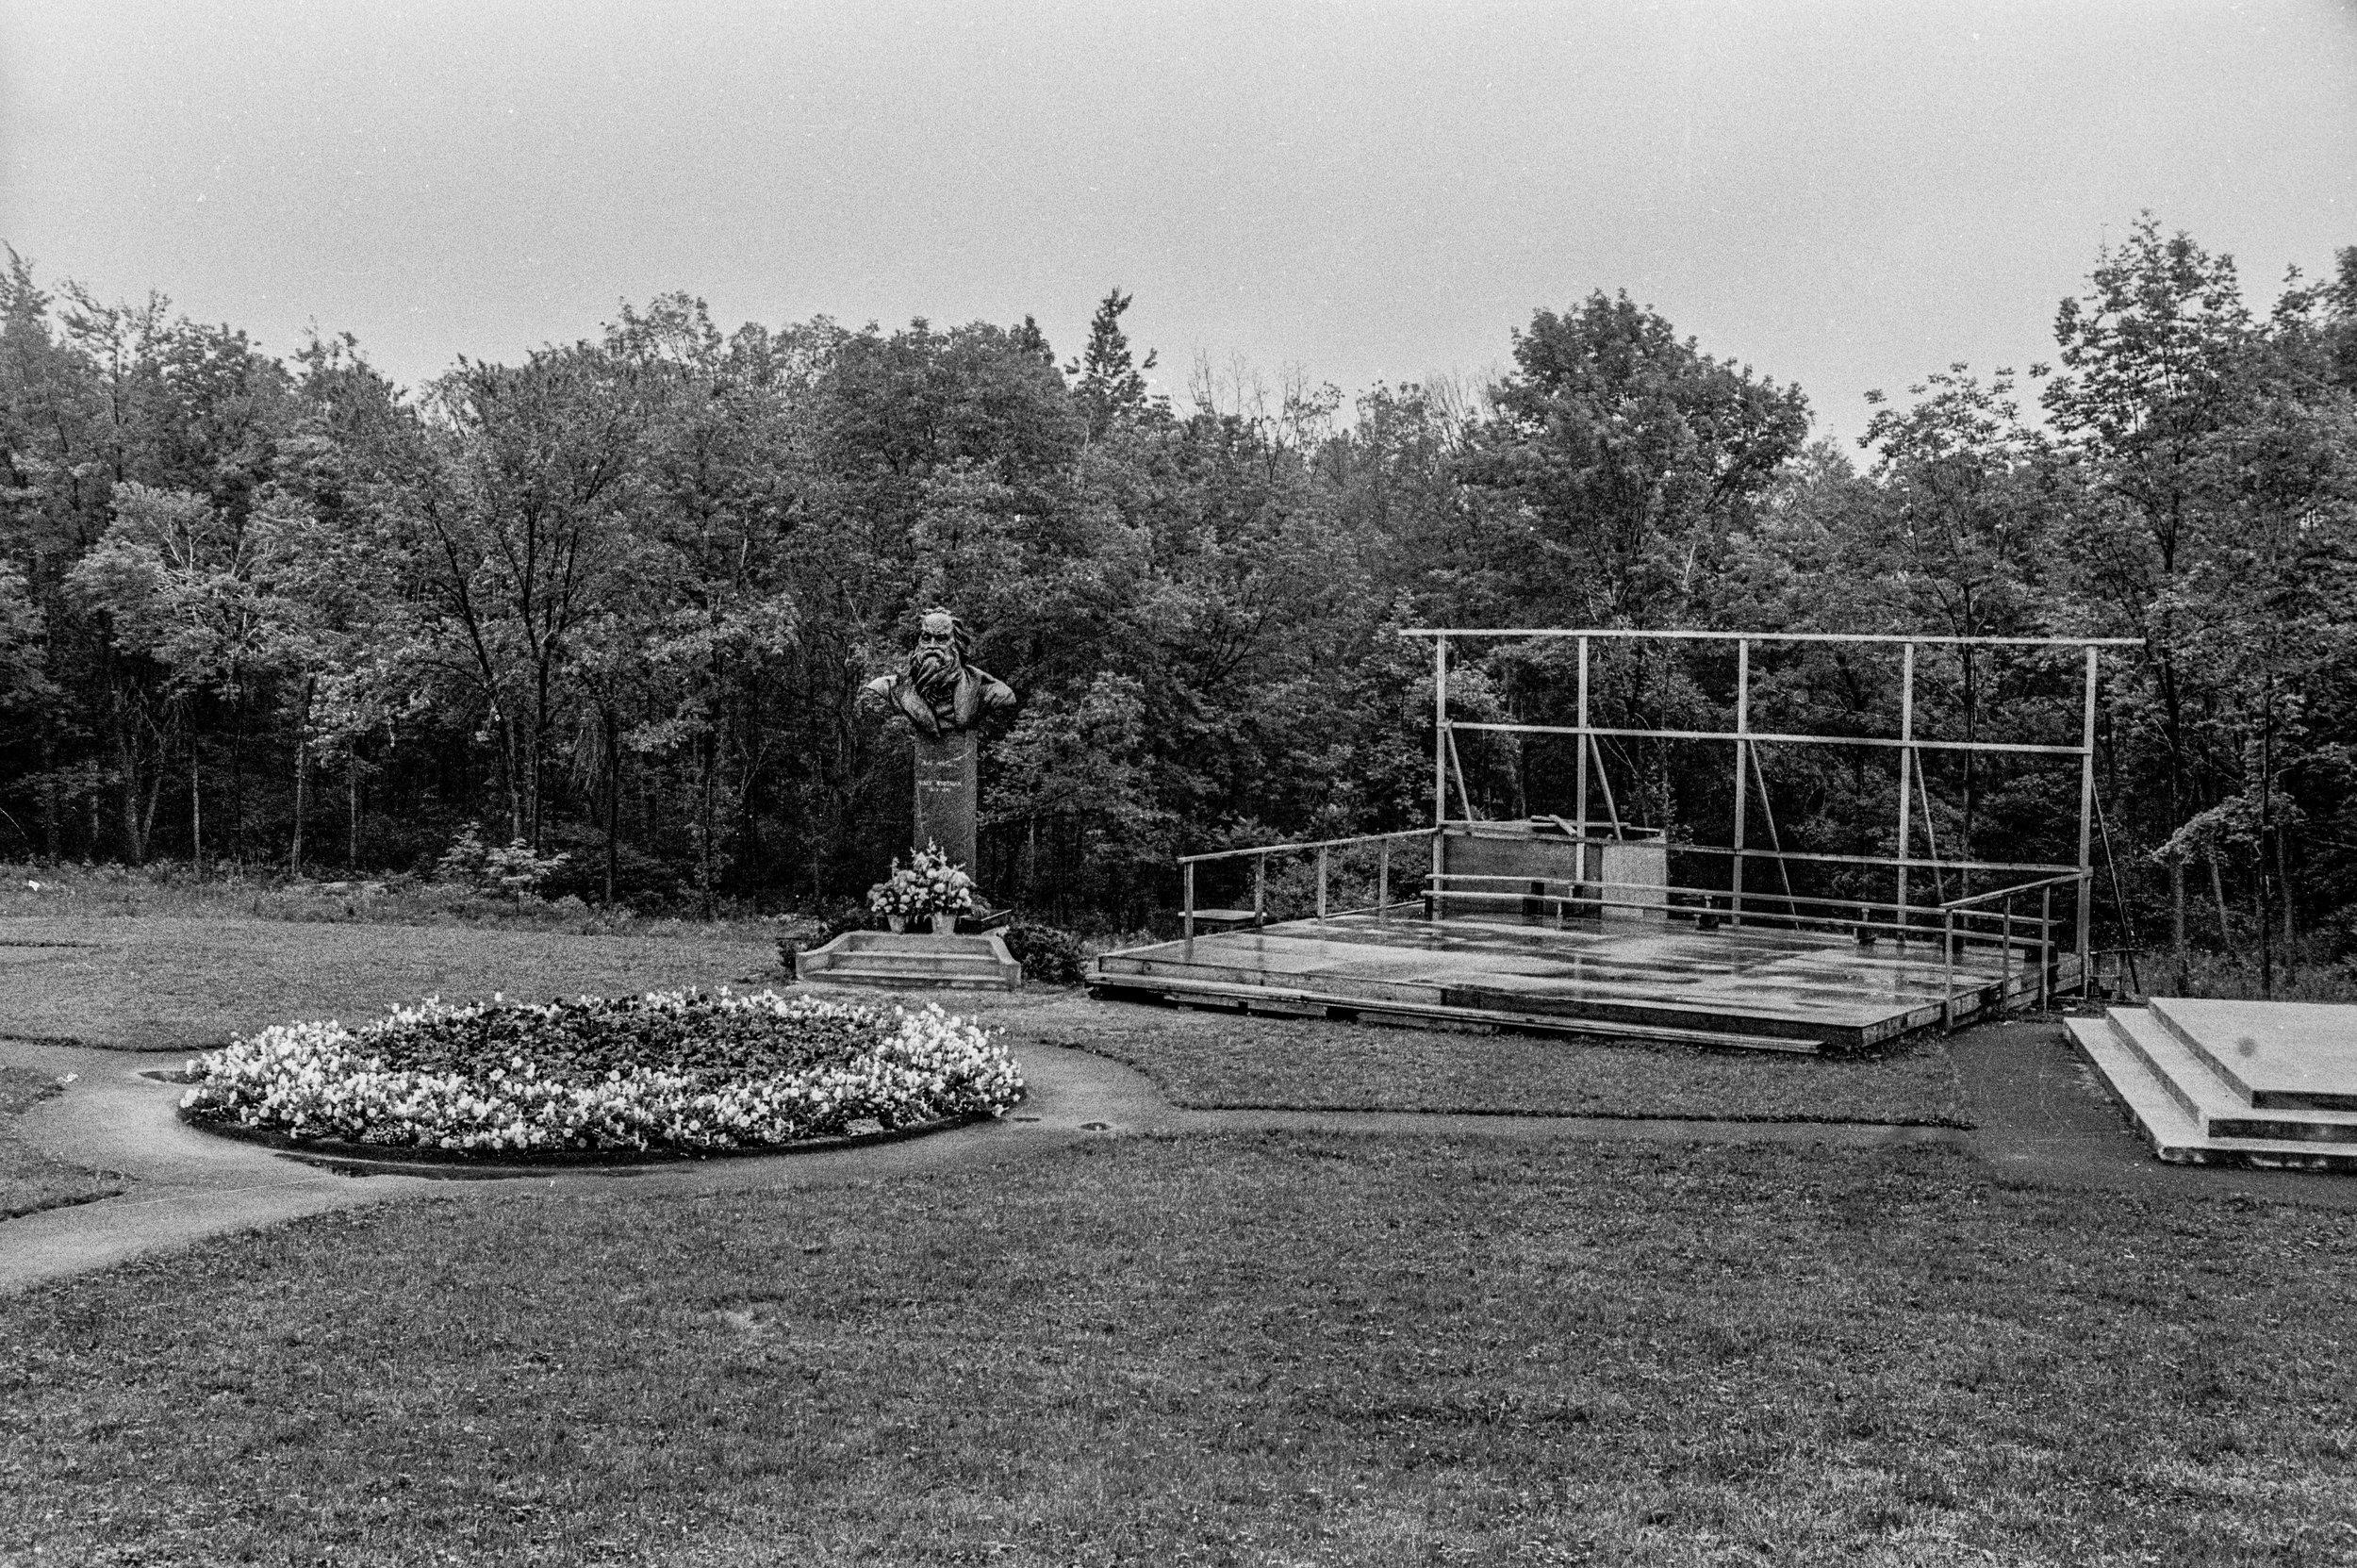 Workmen's Circle Picnic, NY, 1971